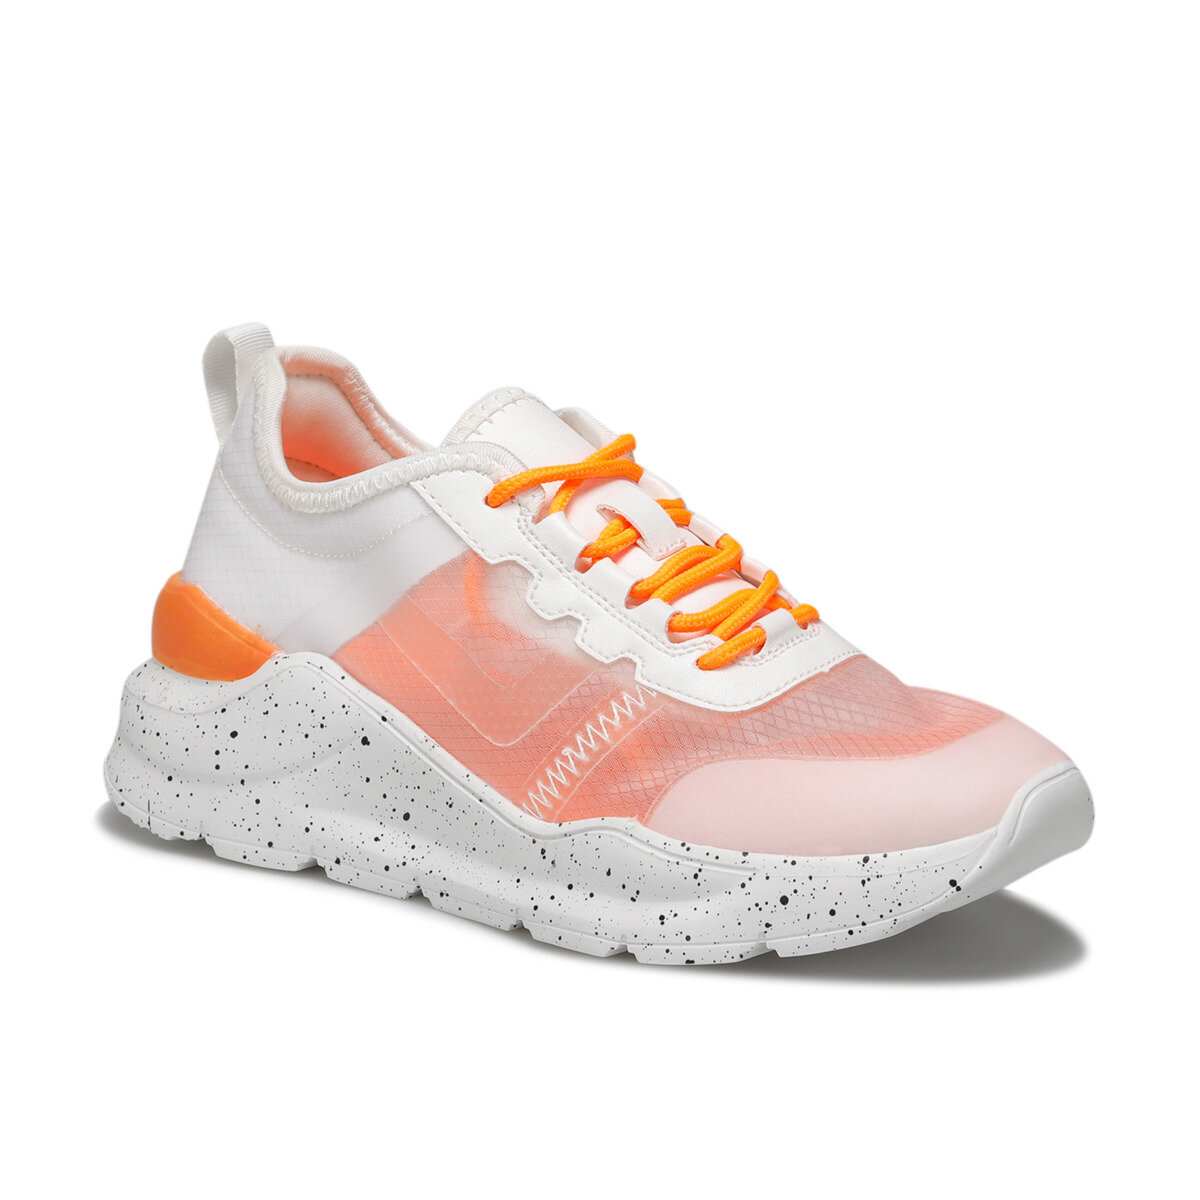 FLO Orange White Women Sneaker Fashion Shoes Transparent Casual Shoes LUMBERJACK